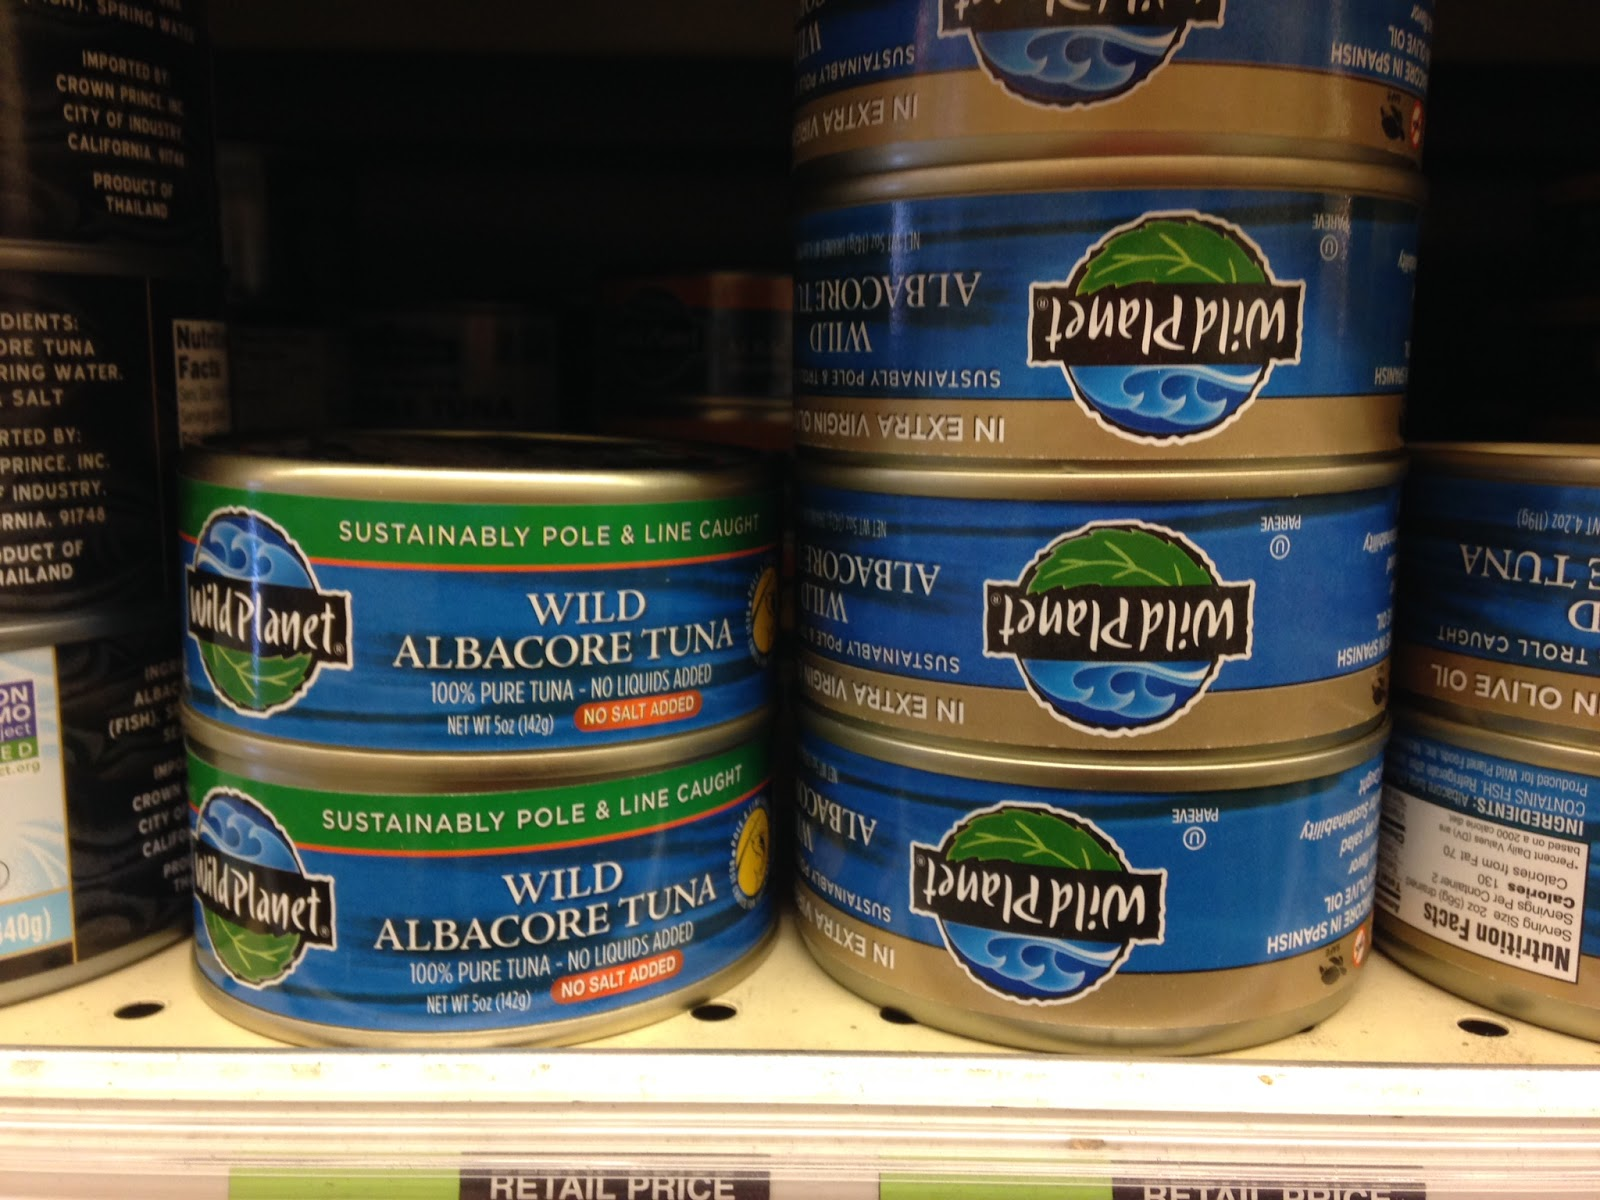 Natural Sea Tuna Brand Whole Foods